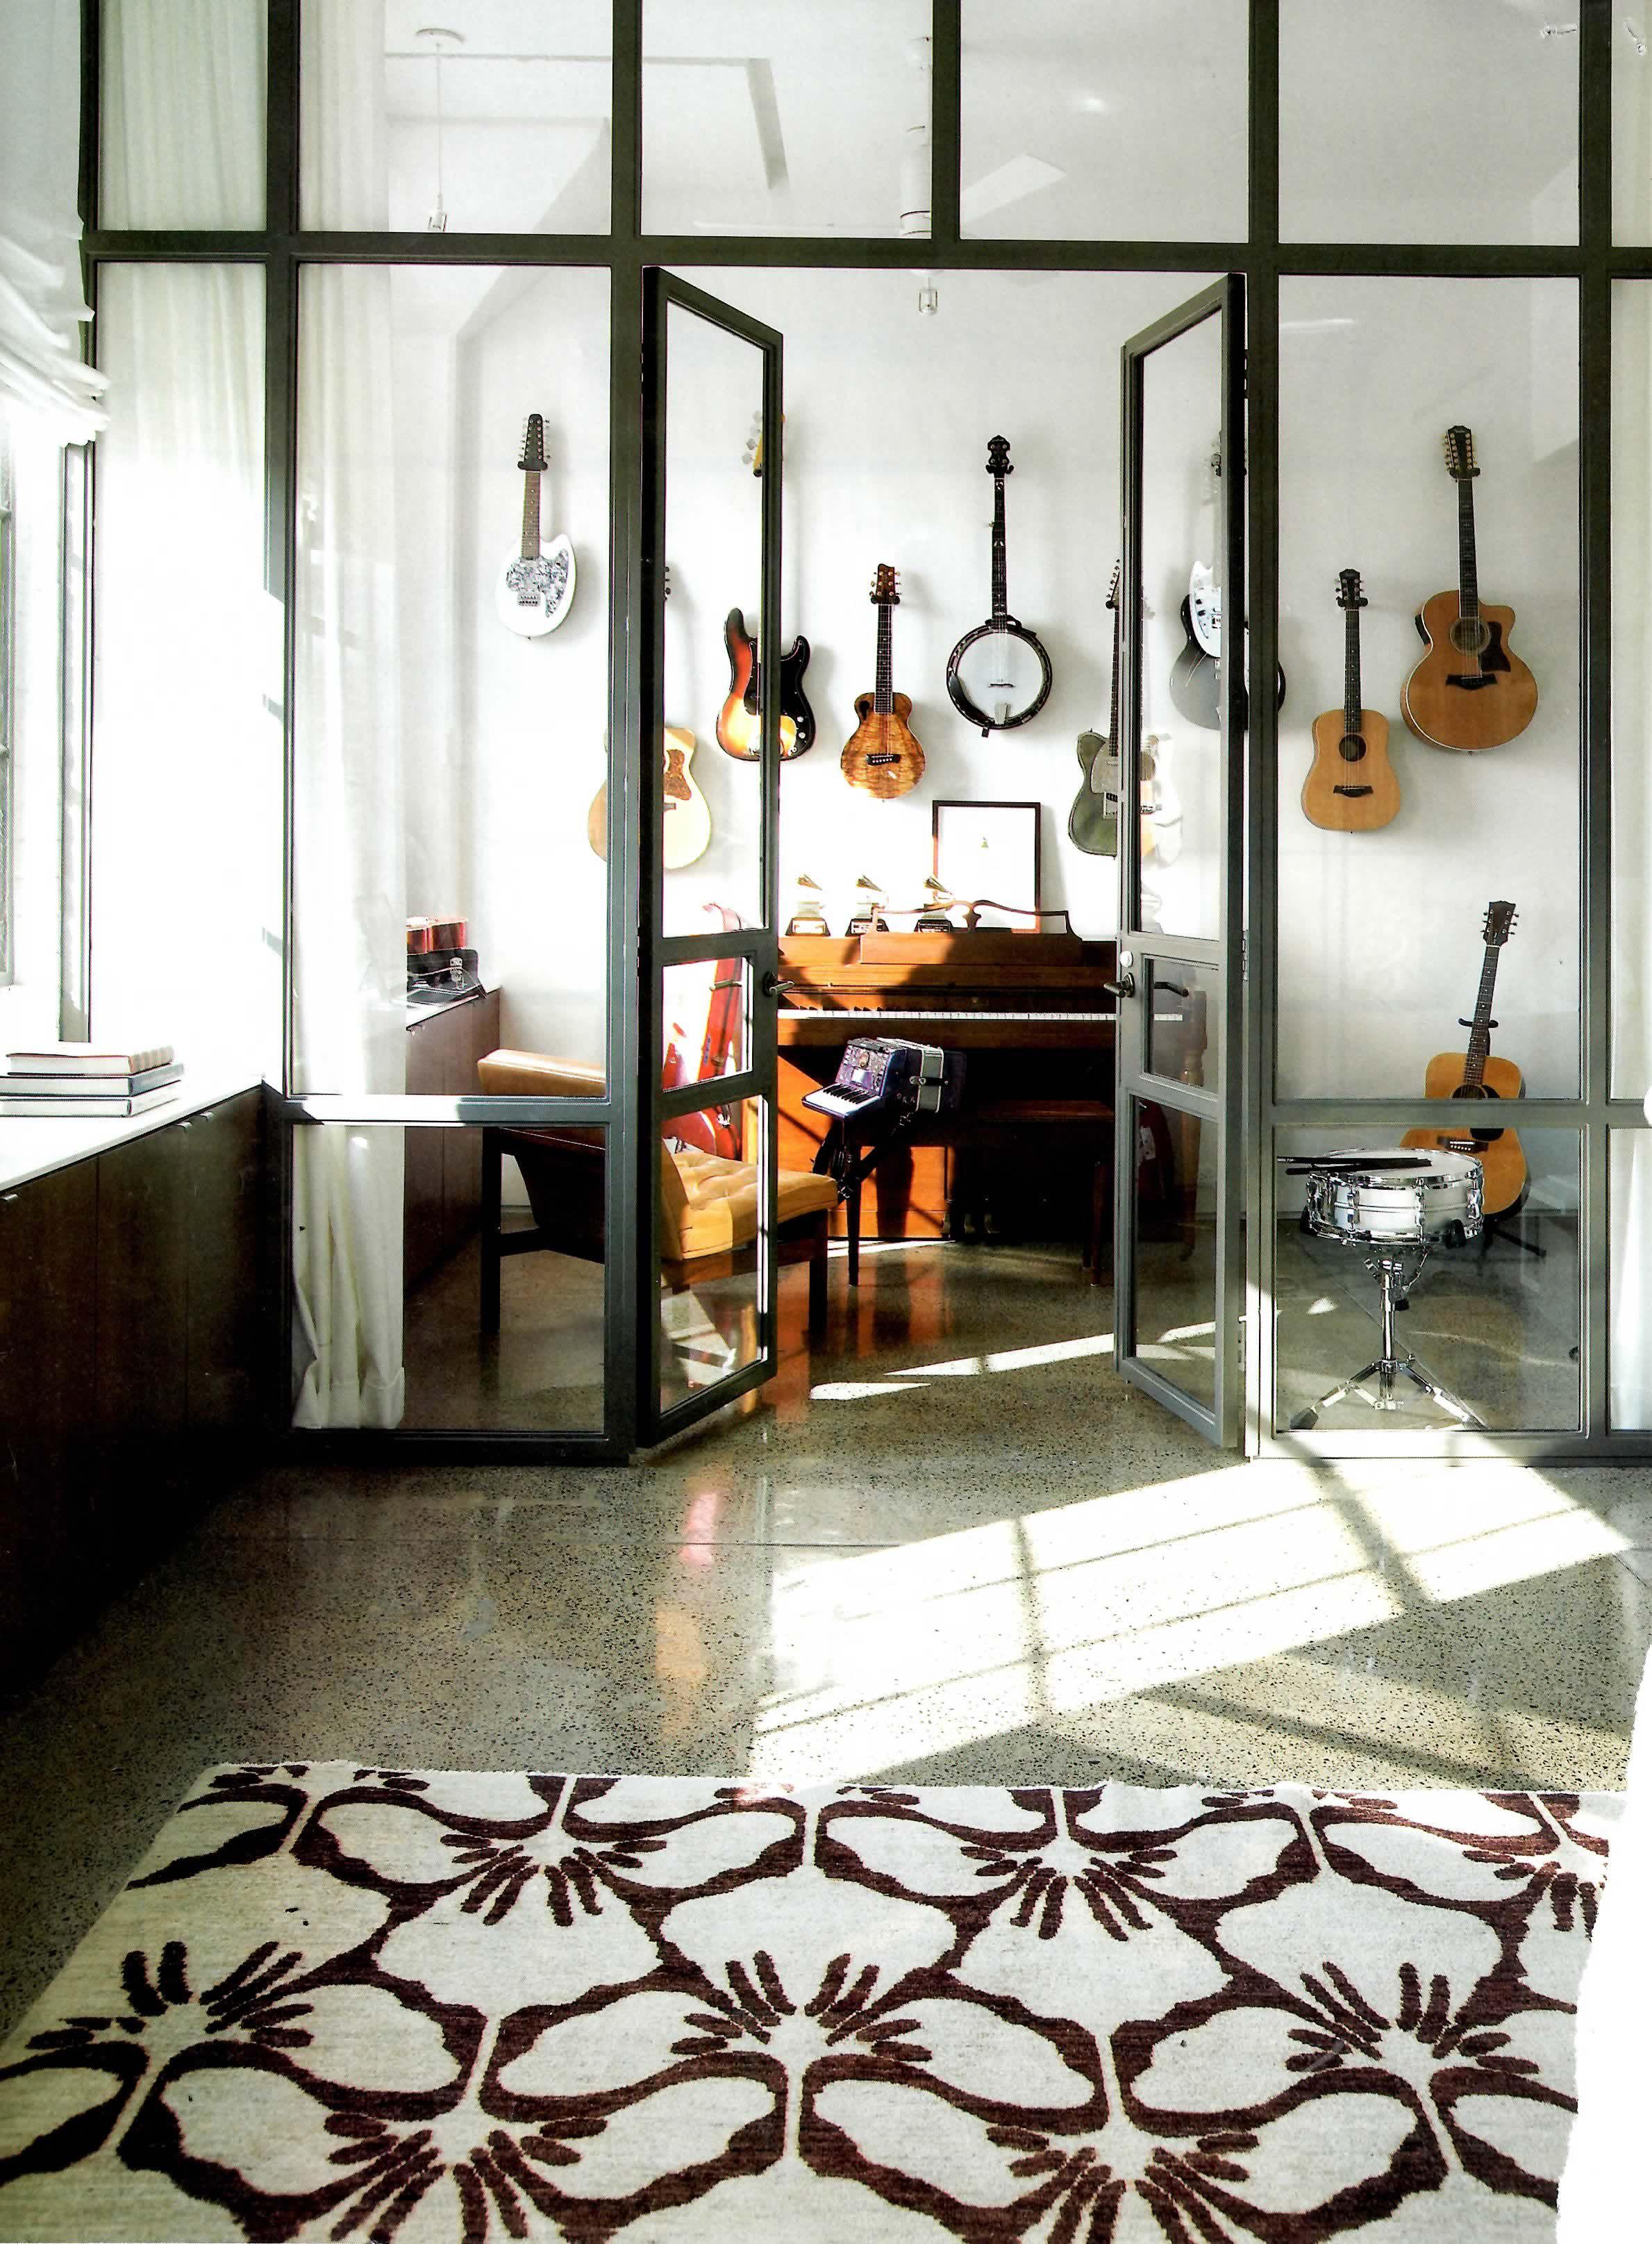 House Music Room: Industrial Doors To Music Studio